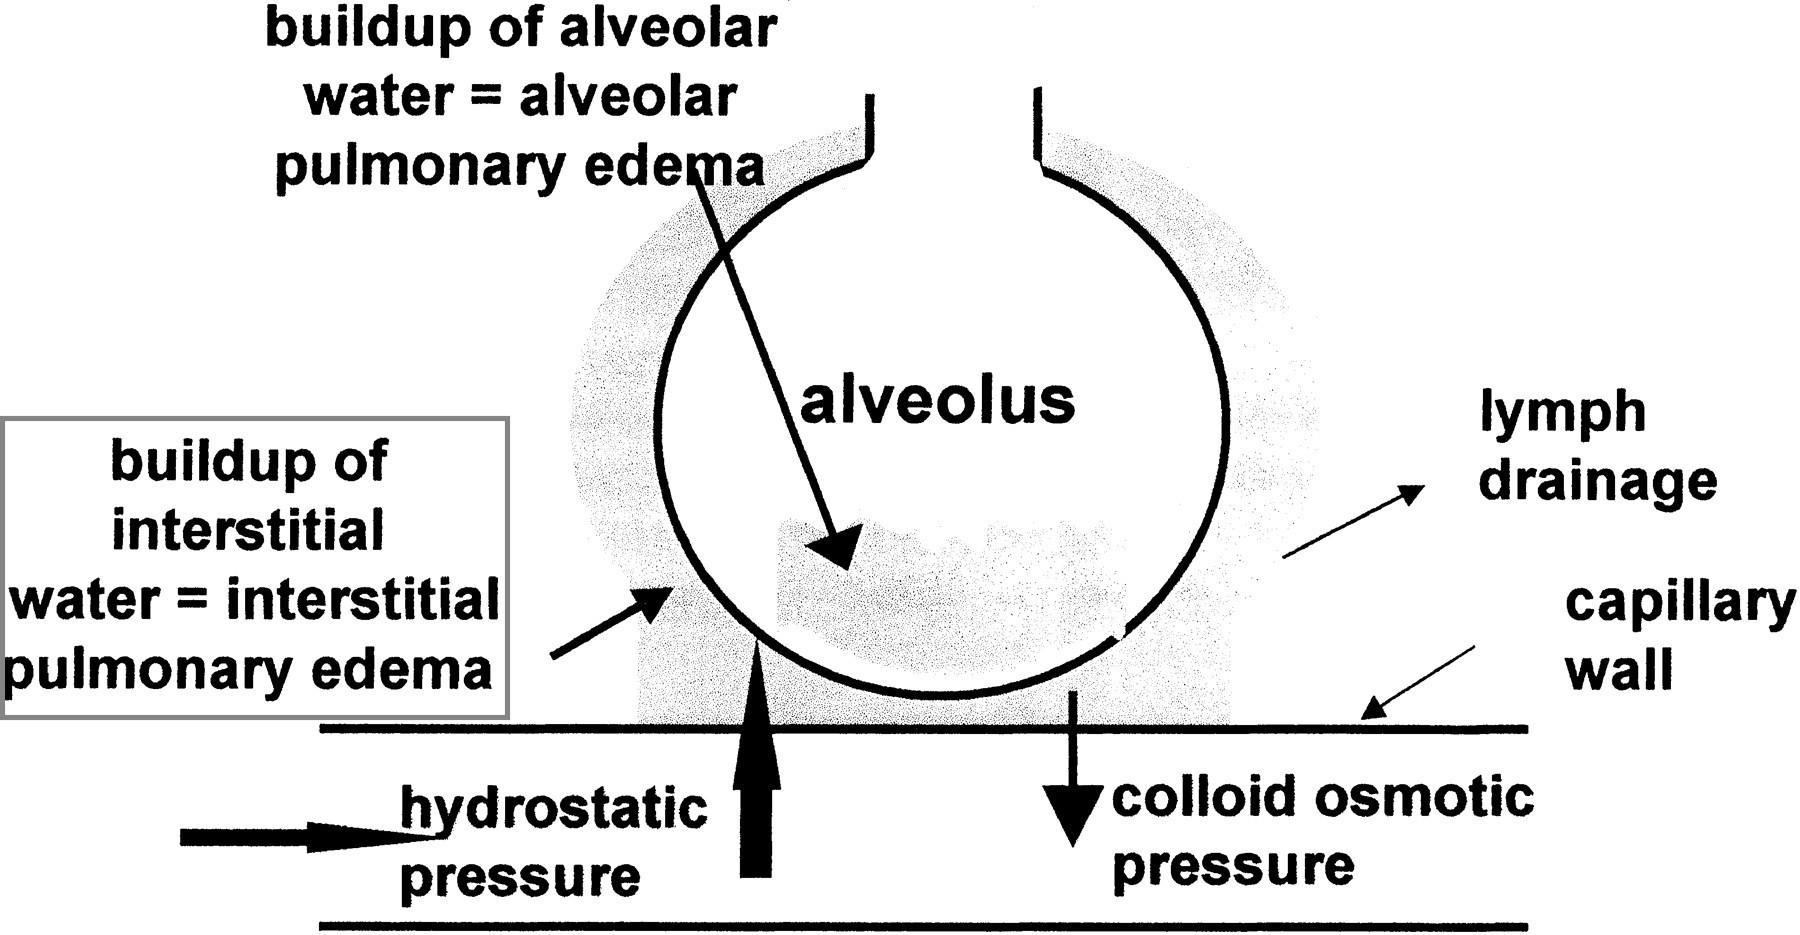 Condition Specific Radiology: Interstitial Pulmonary Edema